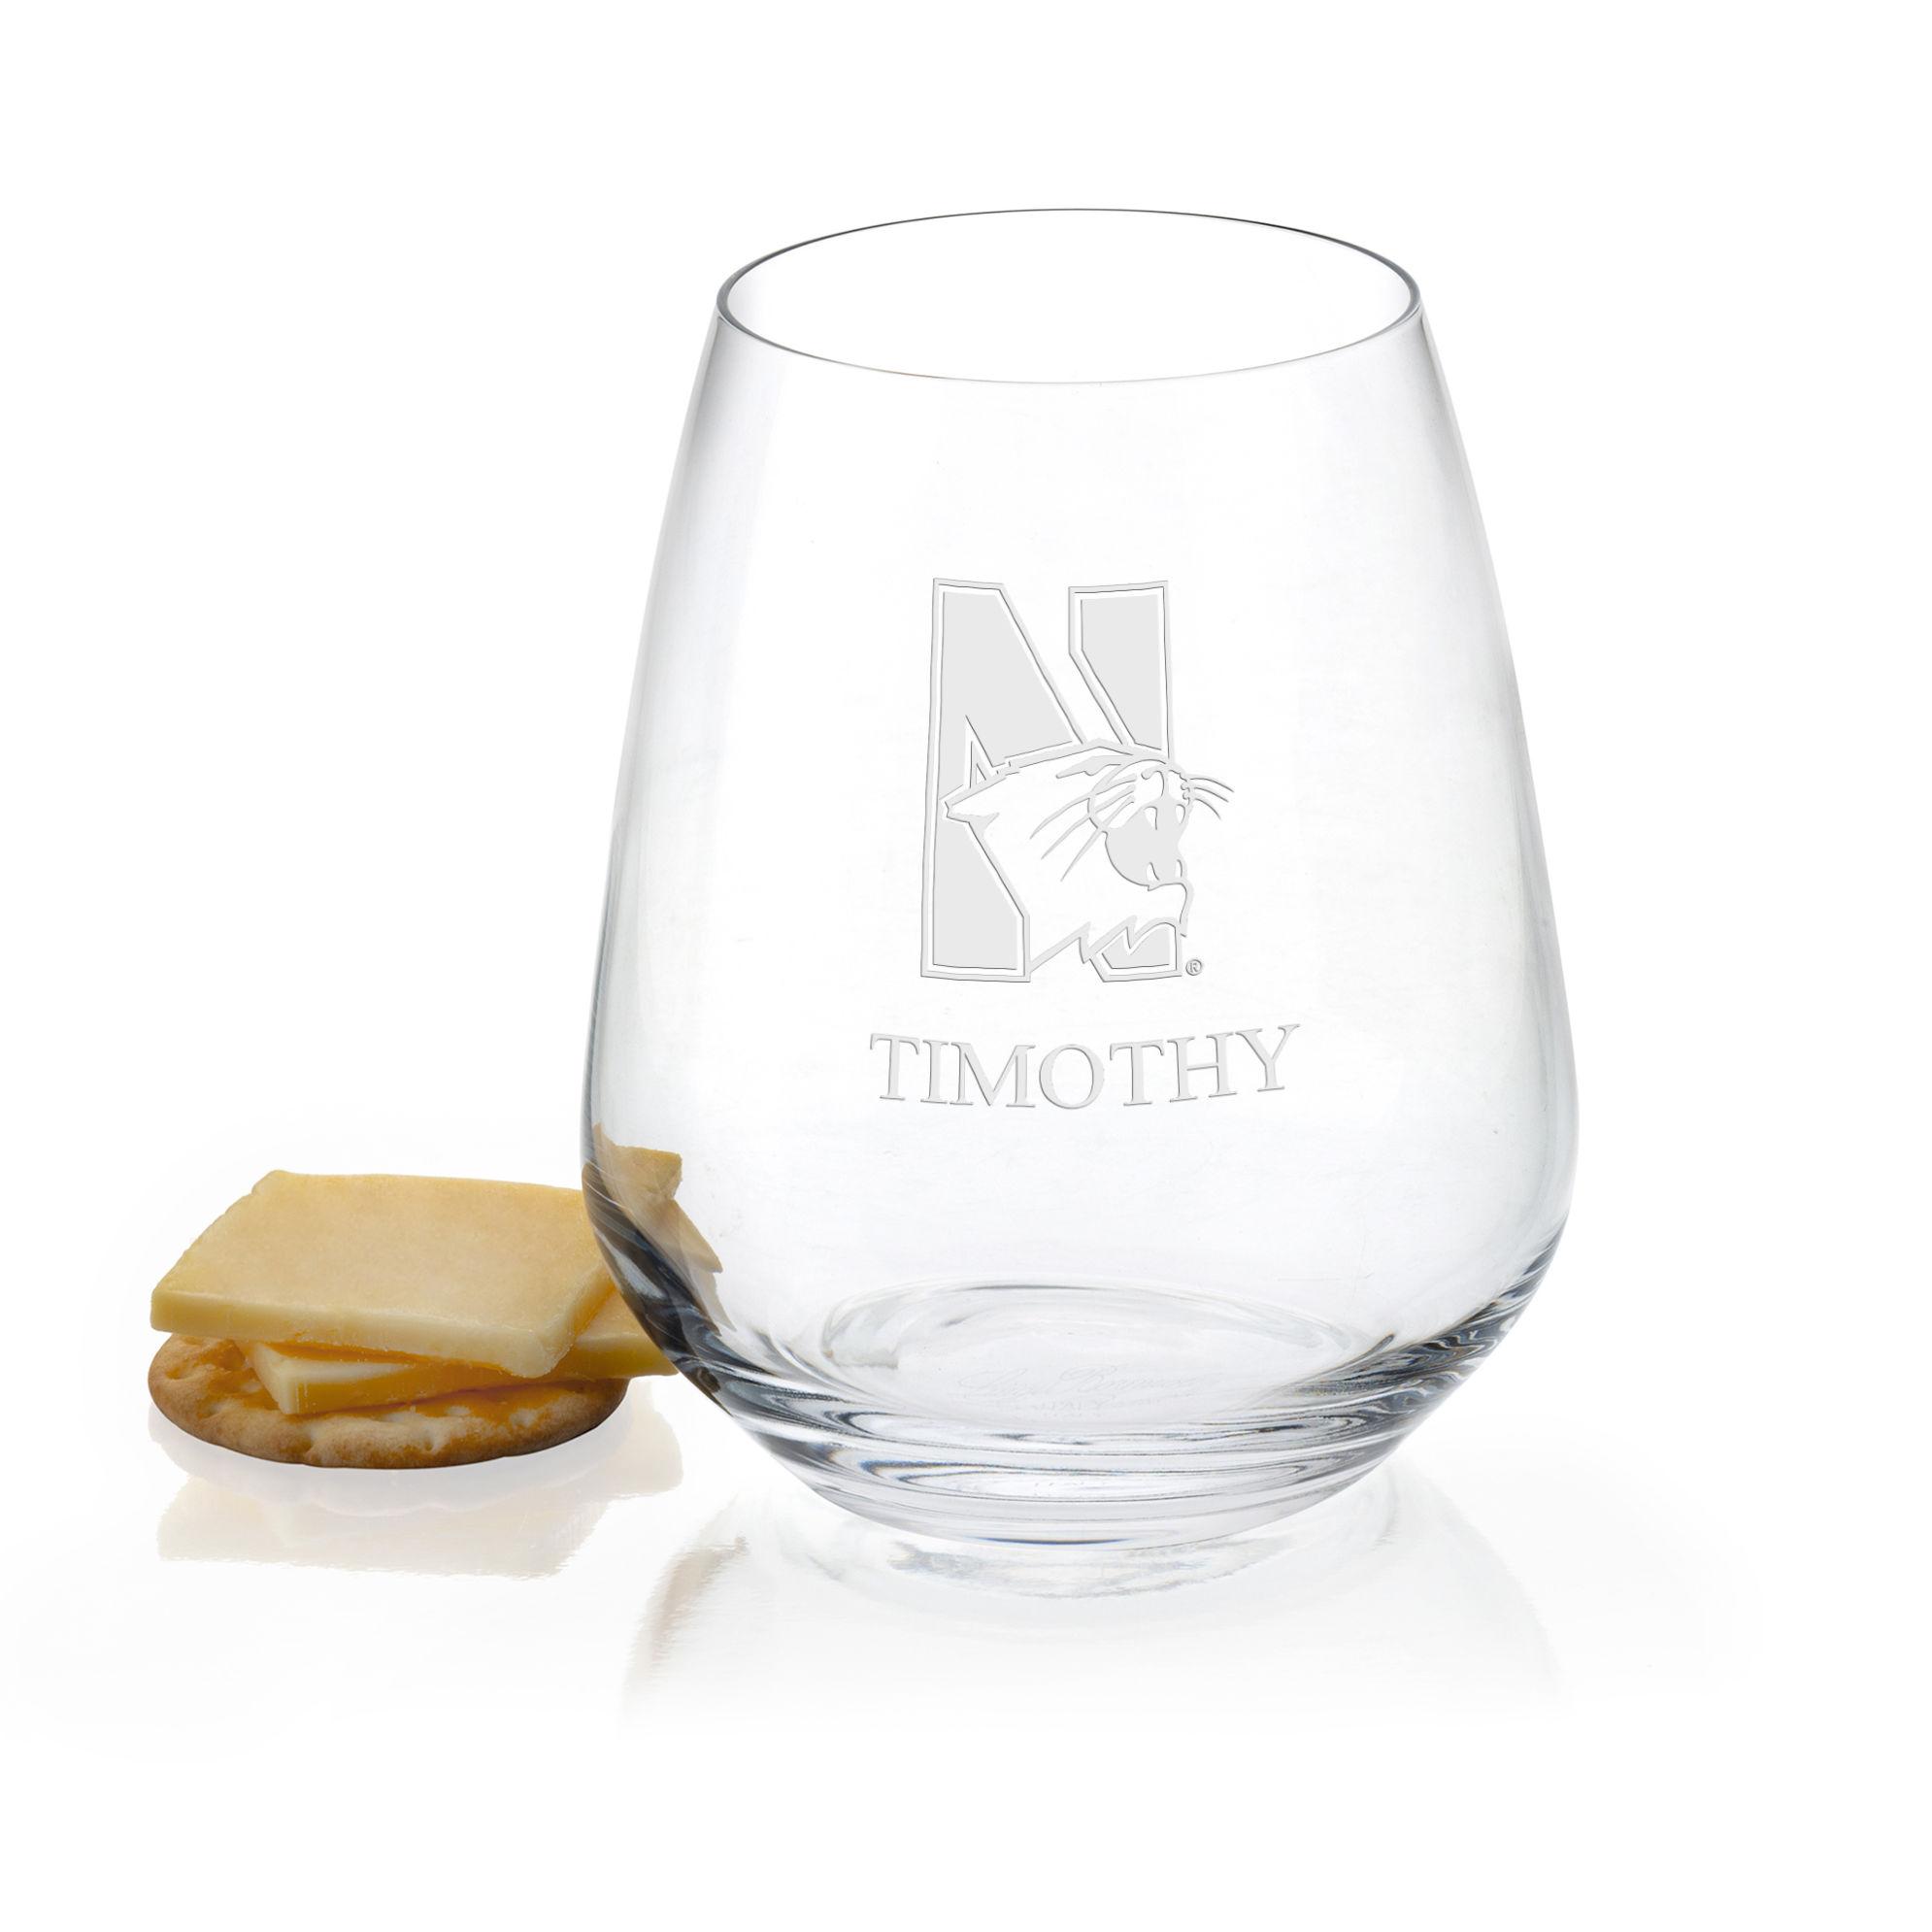 Northwestern University Stemless Wine Glasses - Set of 4